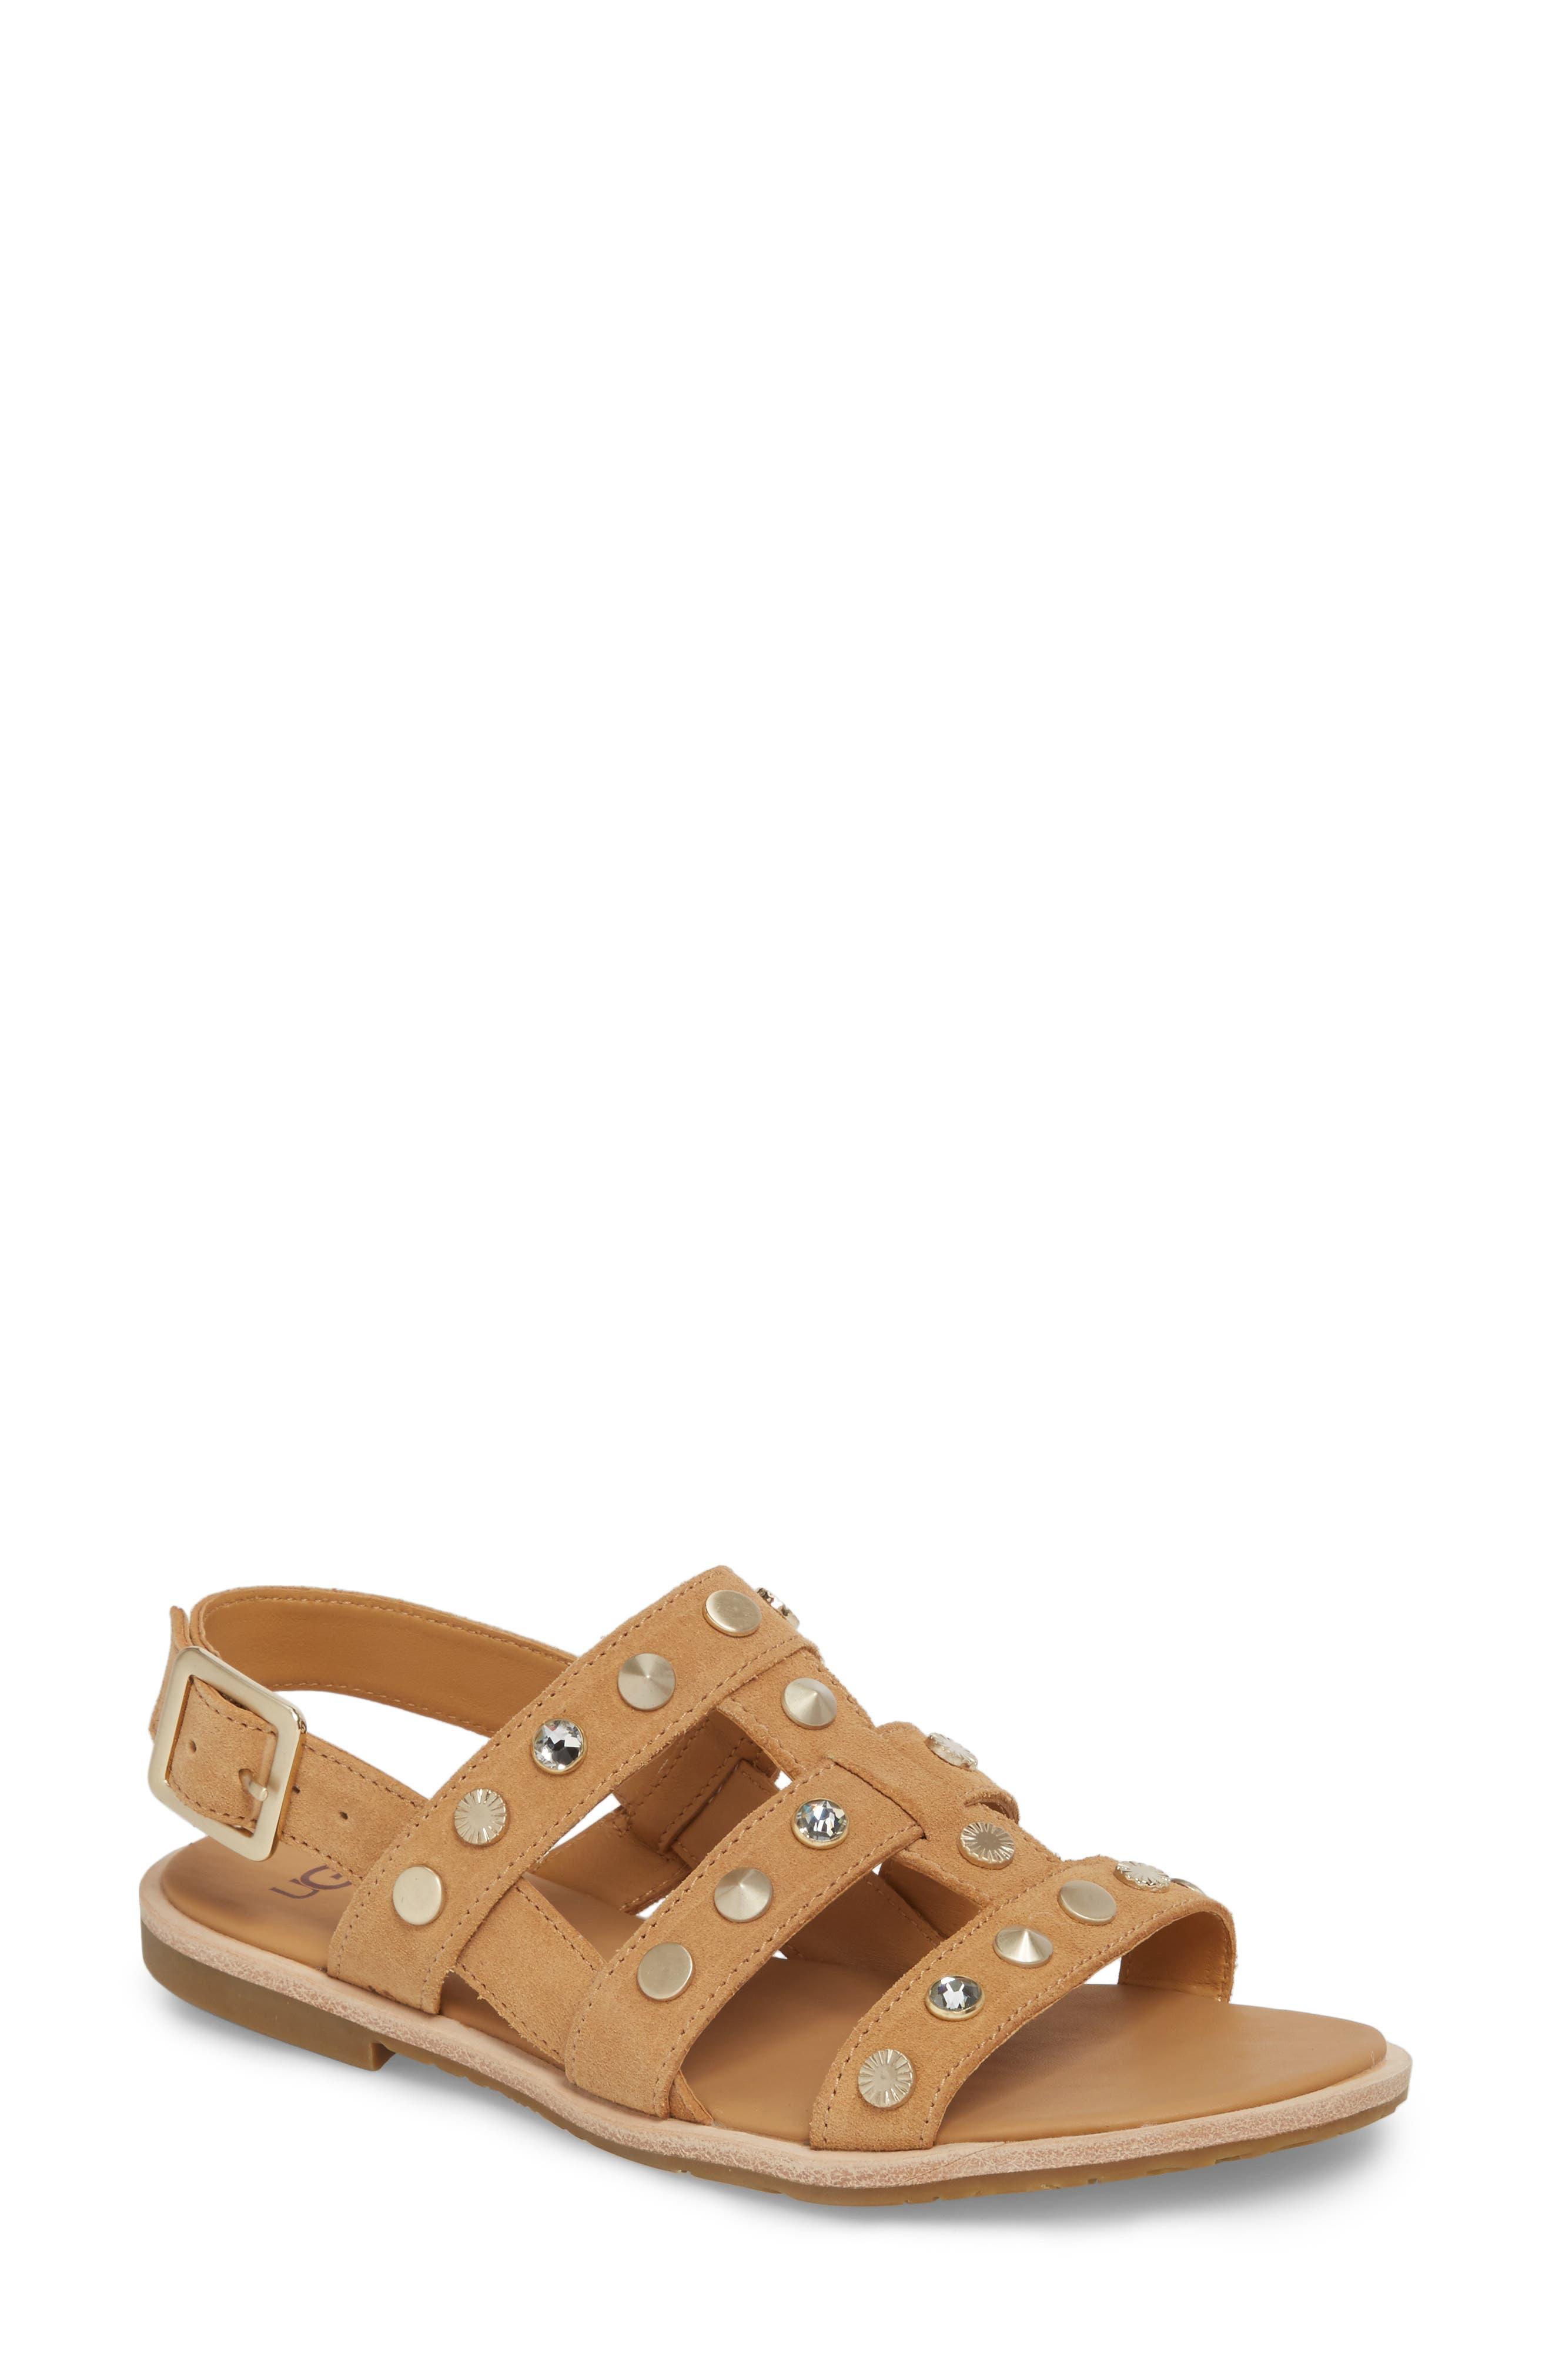 900349c1c Ugg Zariah Studded Sandal In Latte Suede